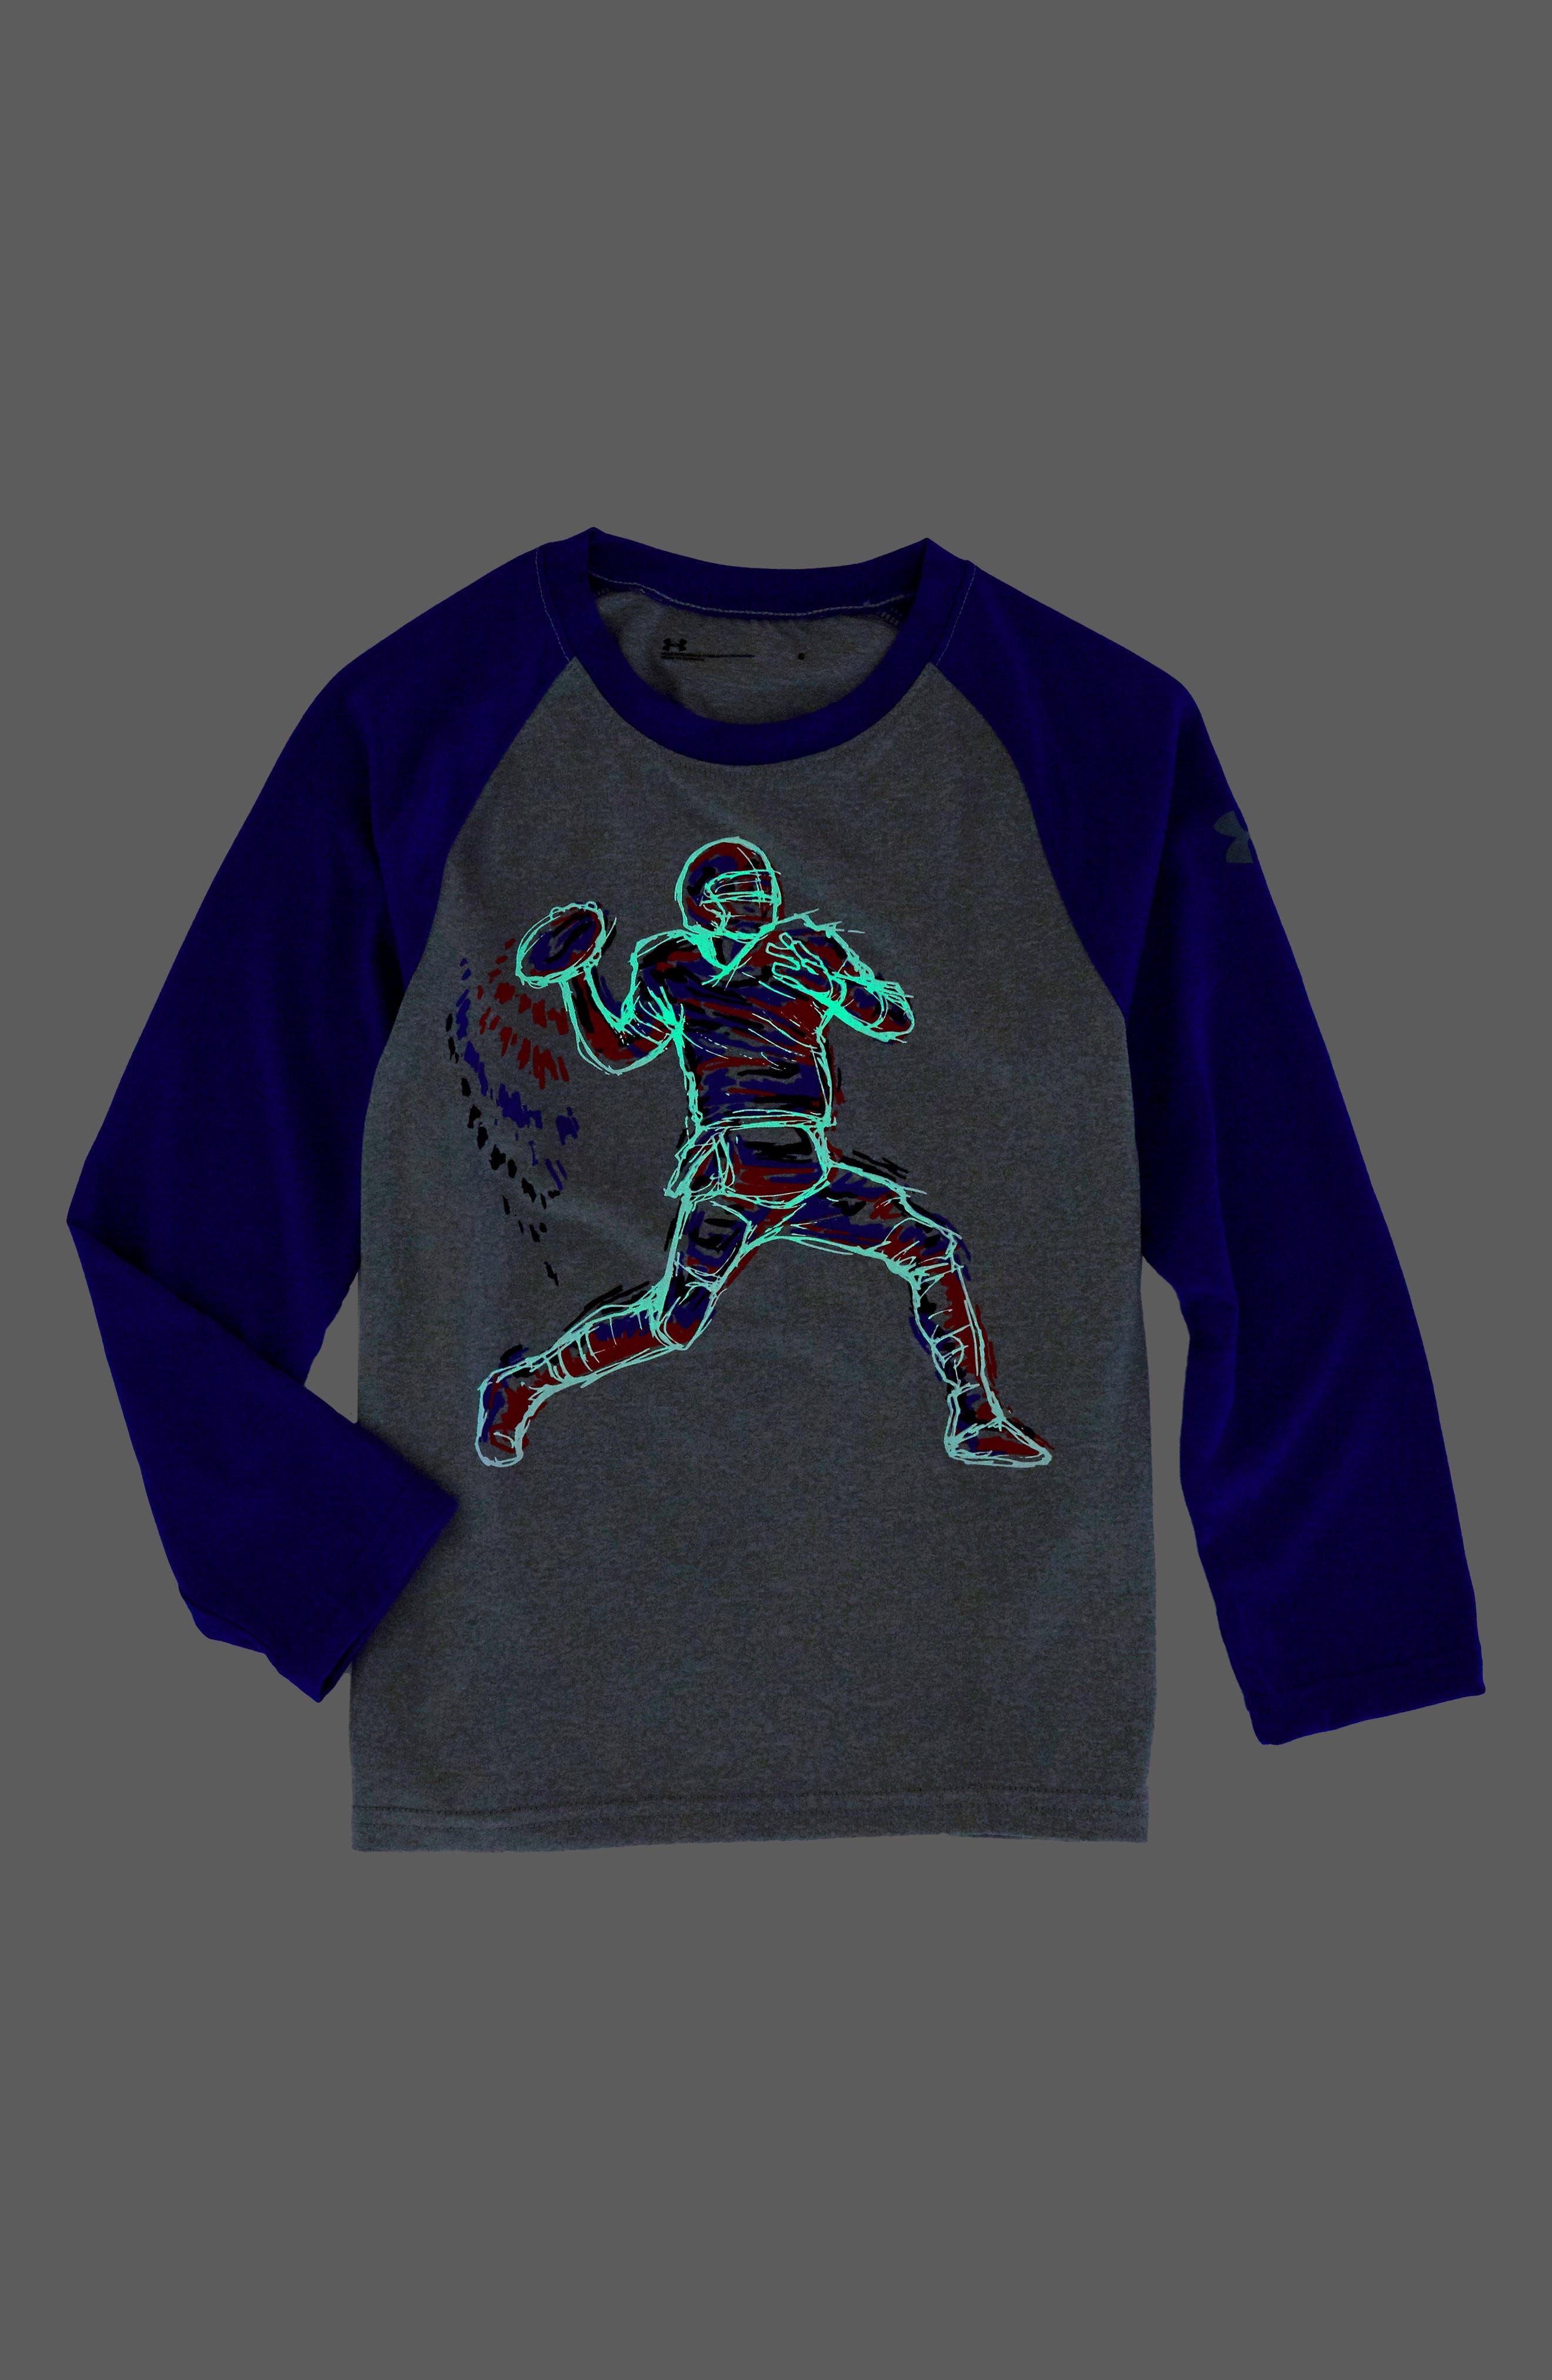 Illuminated QB Glow in the Dark T-Shirt,                             Alternate thumbnail 2, color,                             020